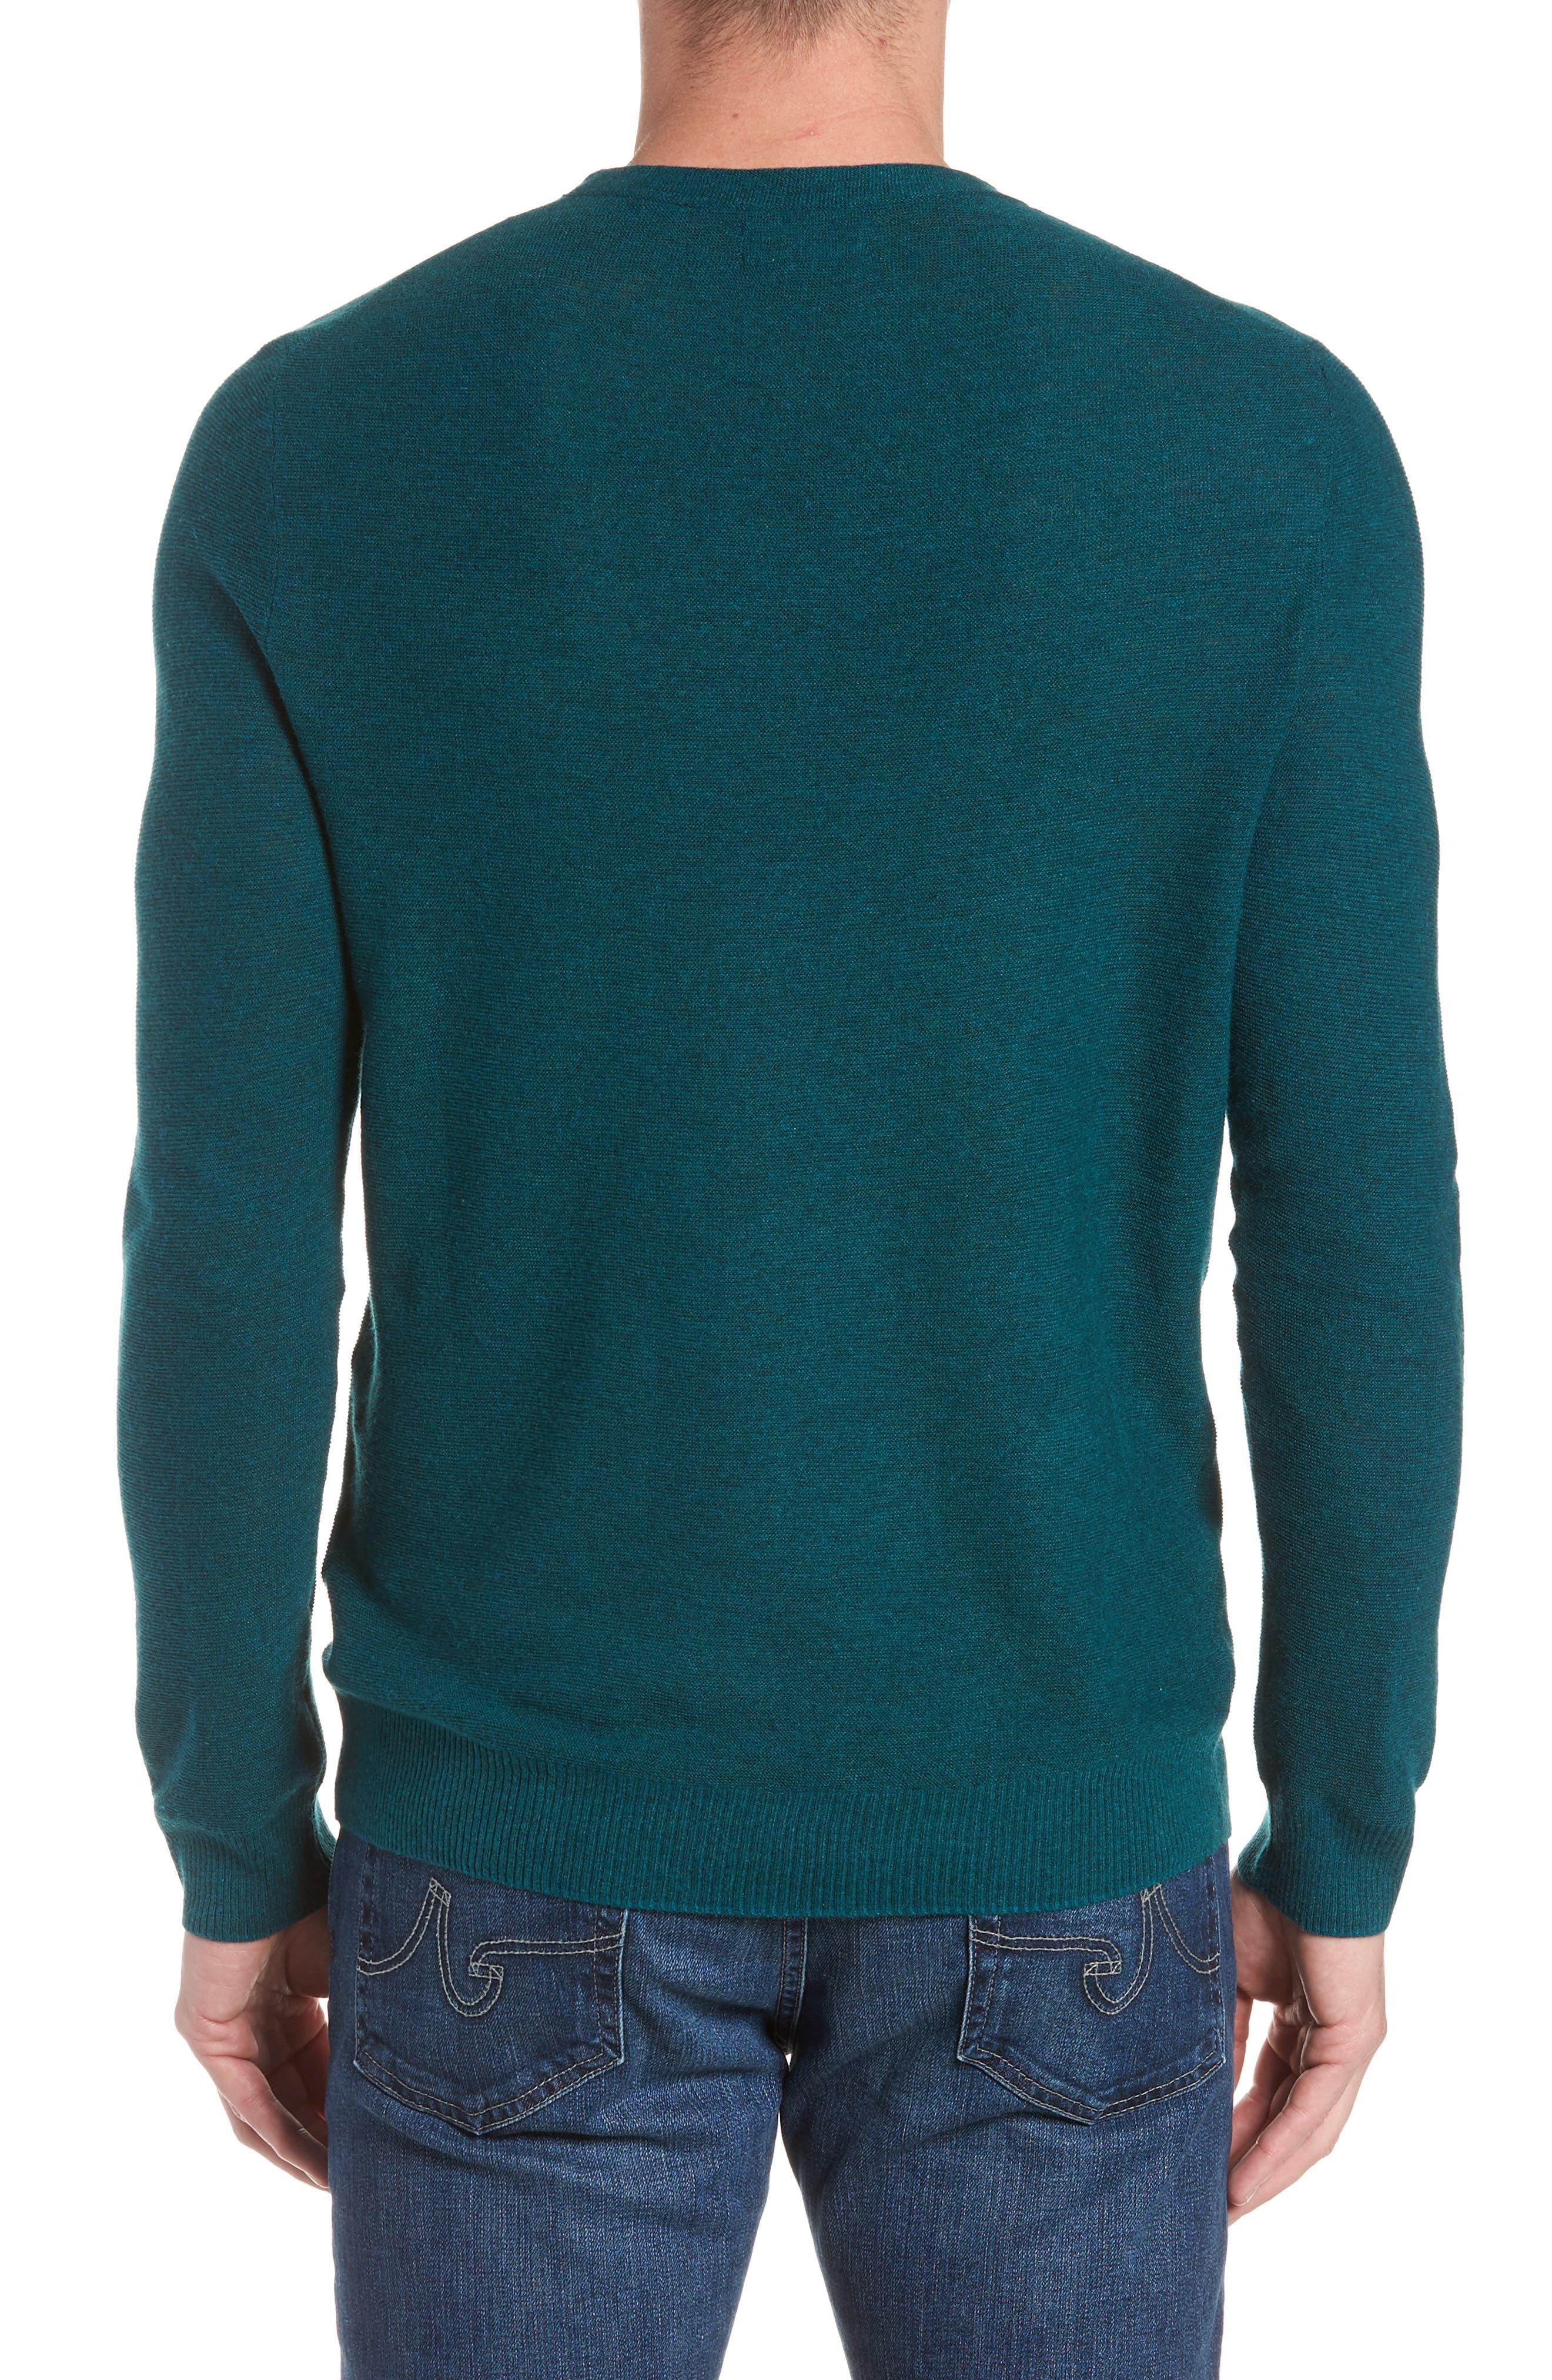 Slim Fit Crewneck Sweater,                             Alternate thumbnail 2, color,                             Heather Peacock